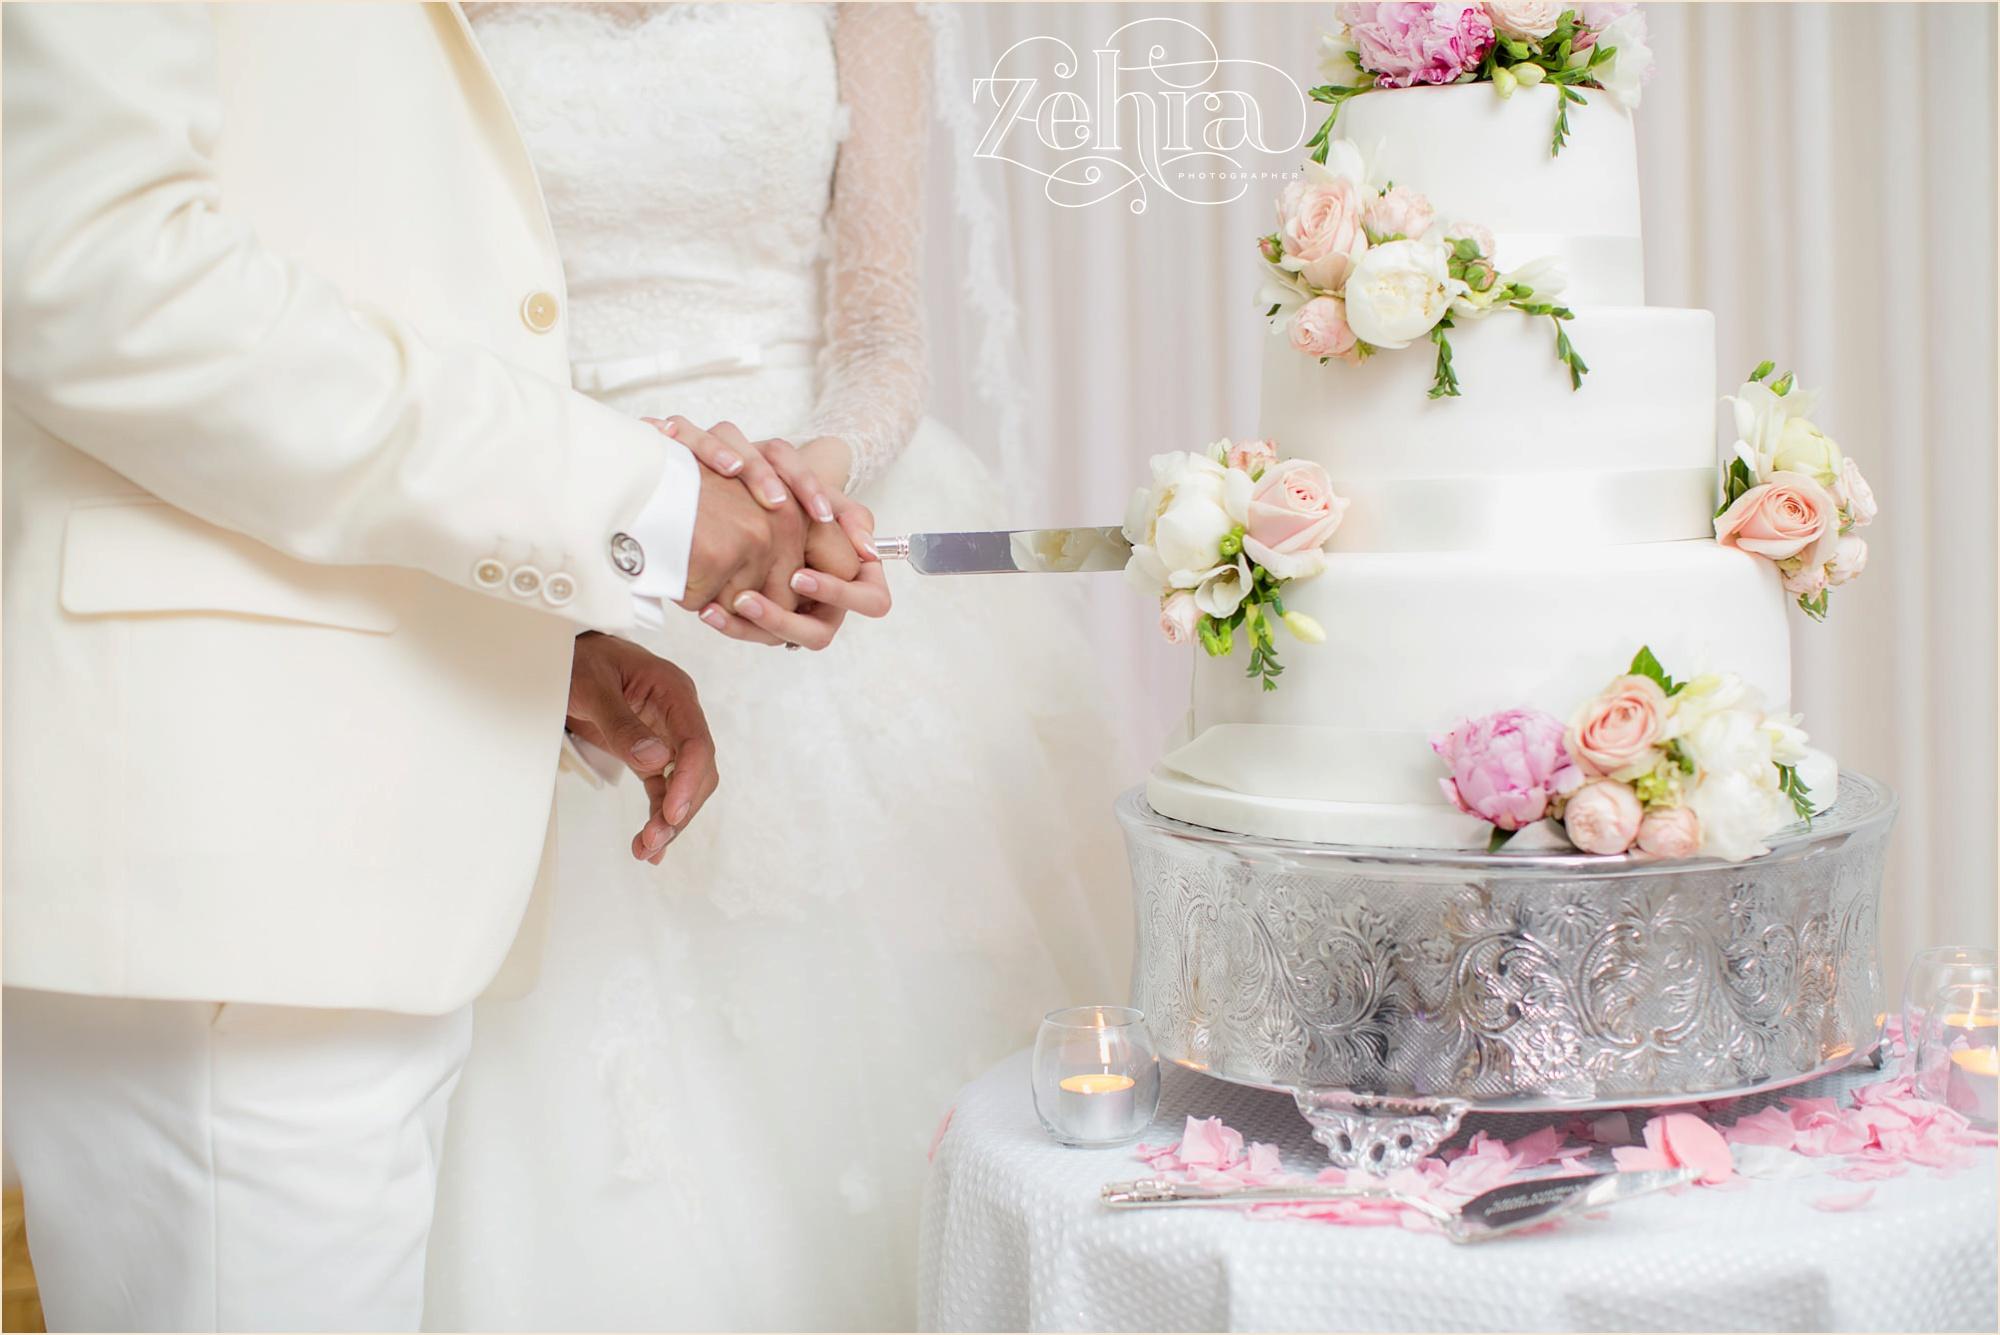 jasira manchester wedding photographer_0044.jpg